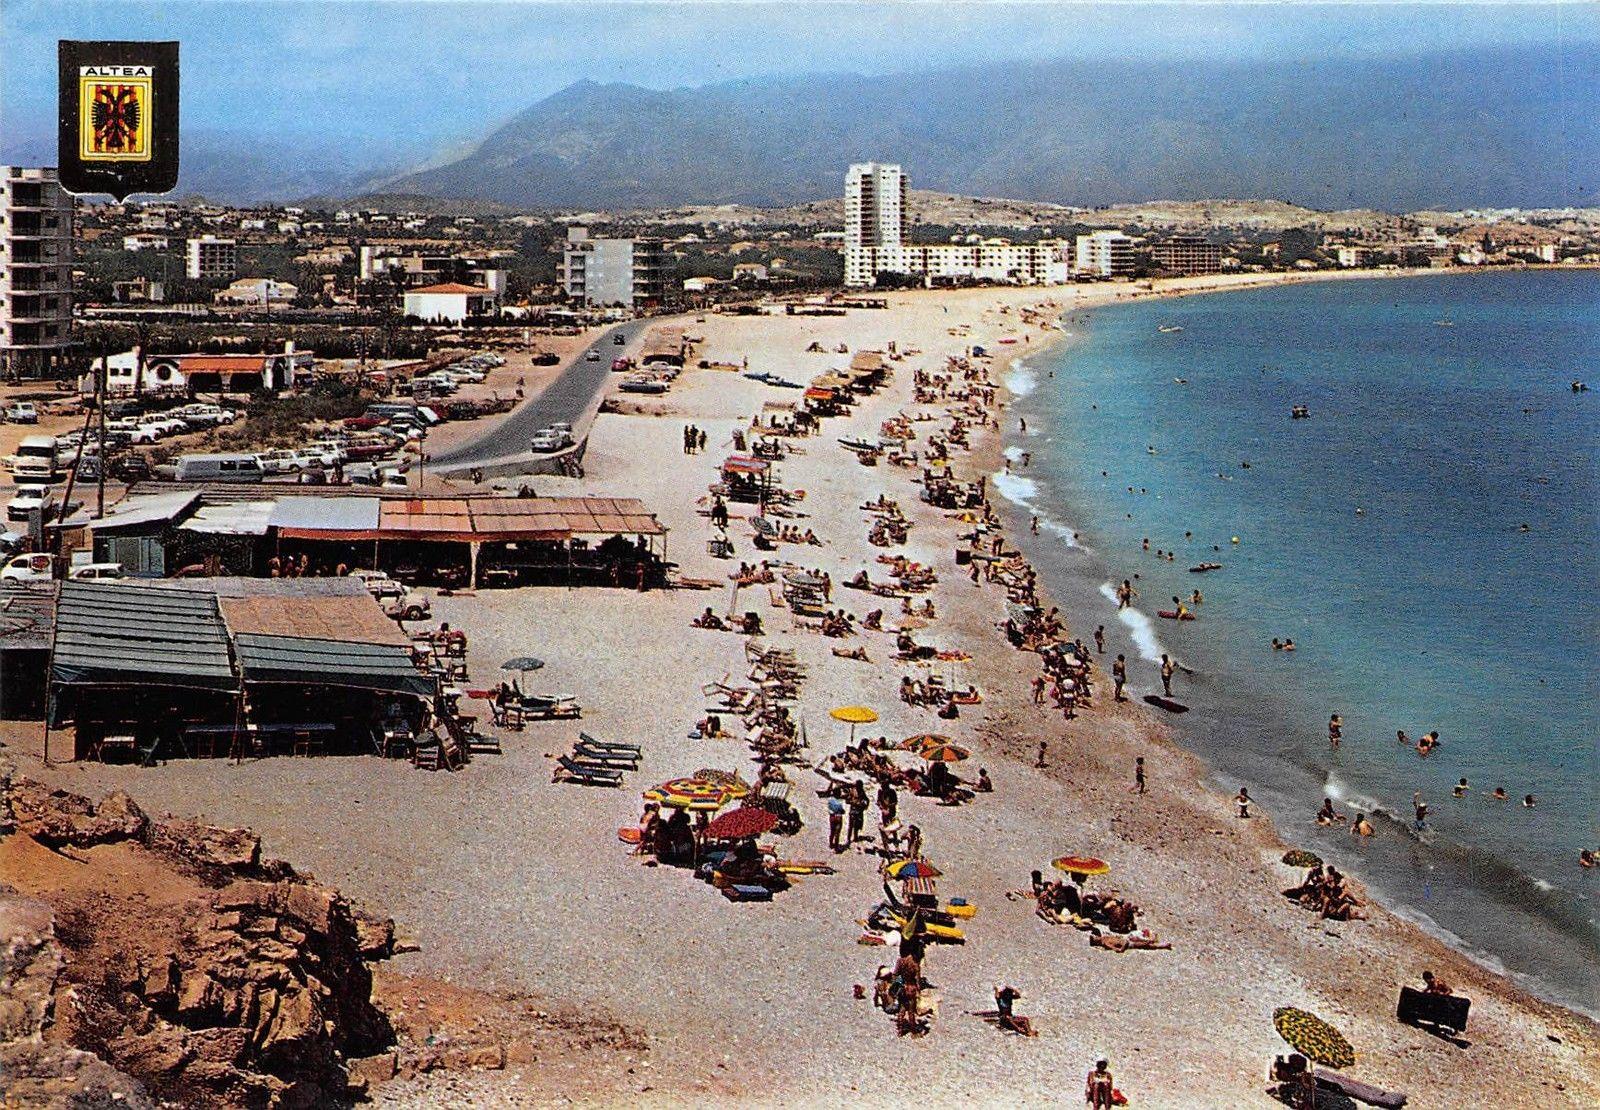 Alle nye Spain Alfaz del Pi Altea Plage de l'Albir Beach Playa del Albir FA-37